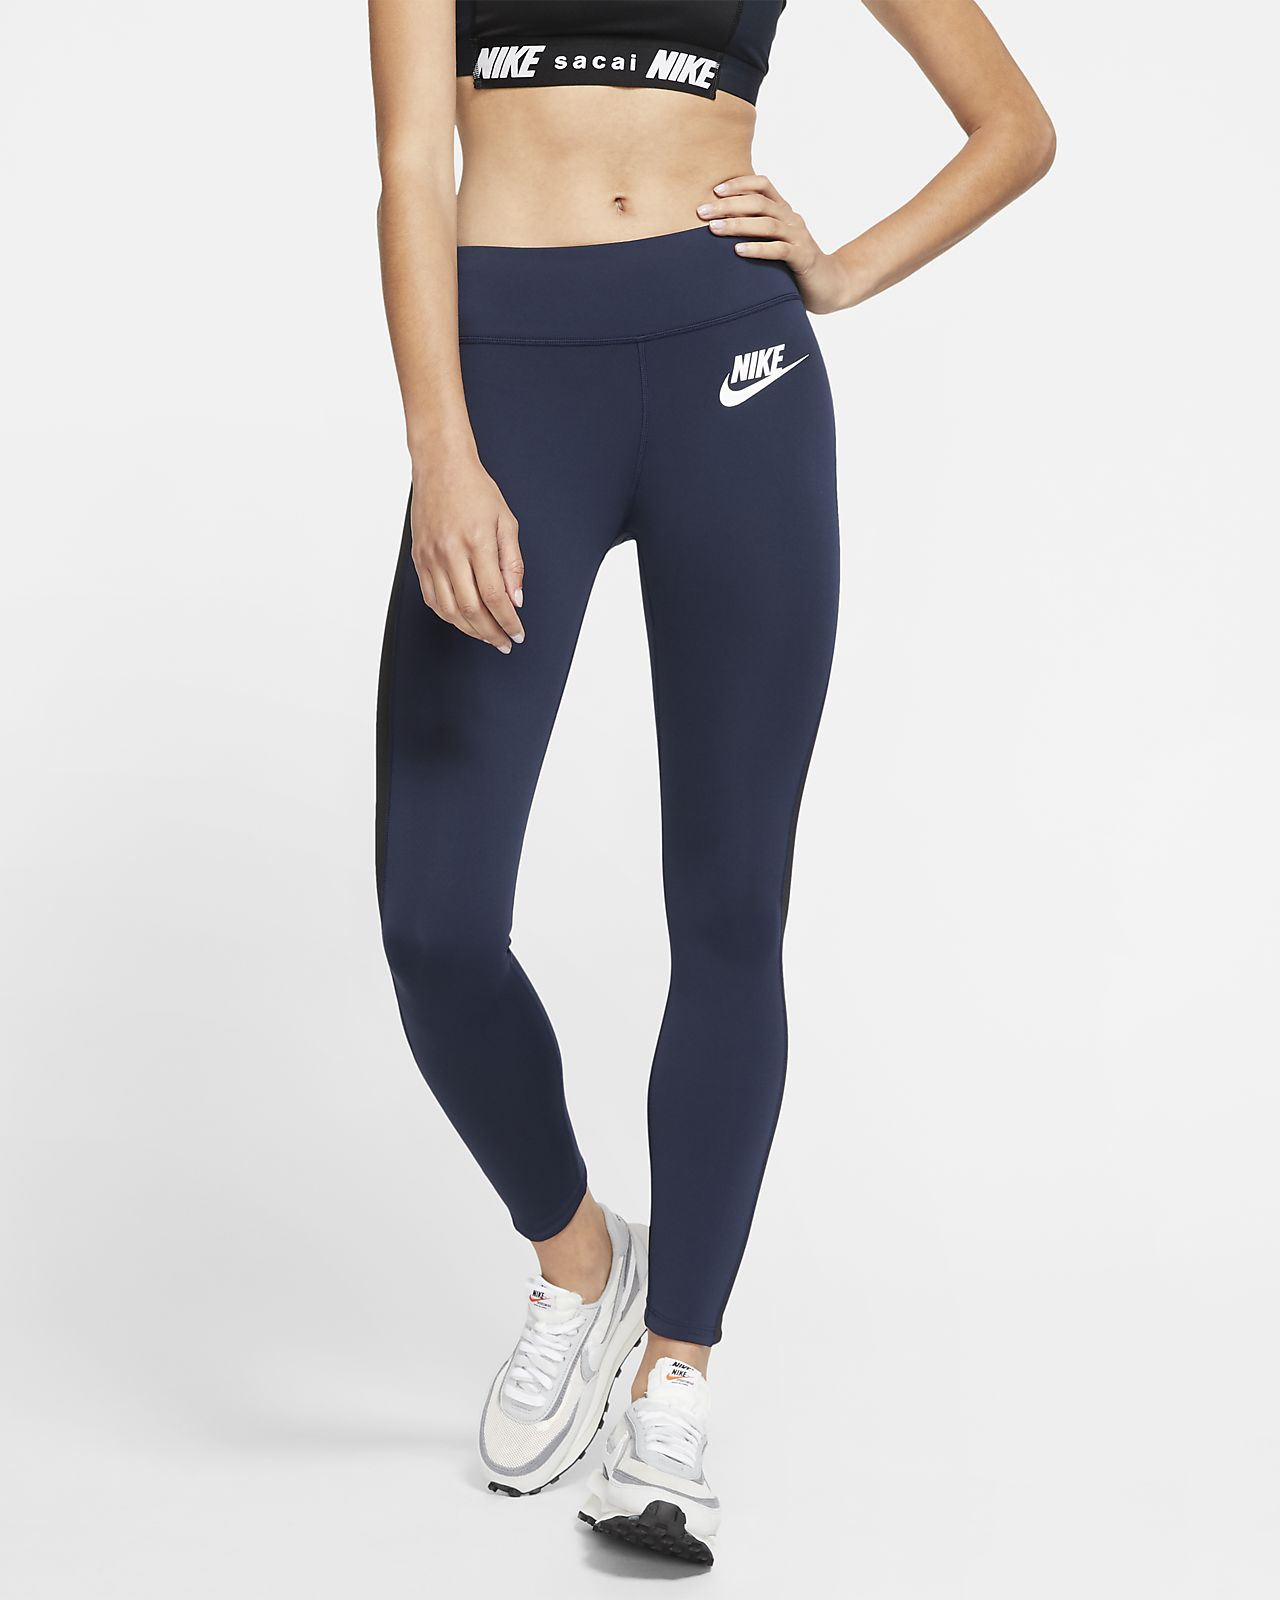 Nike x Sacai Malles de running - Dona